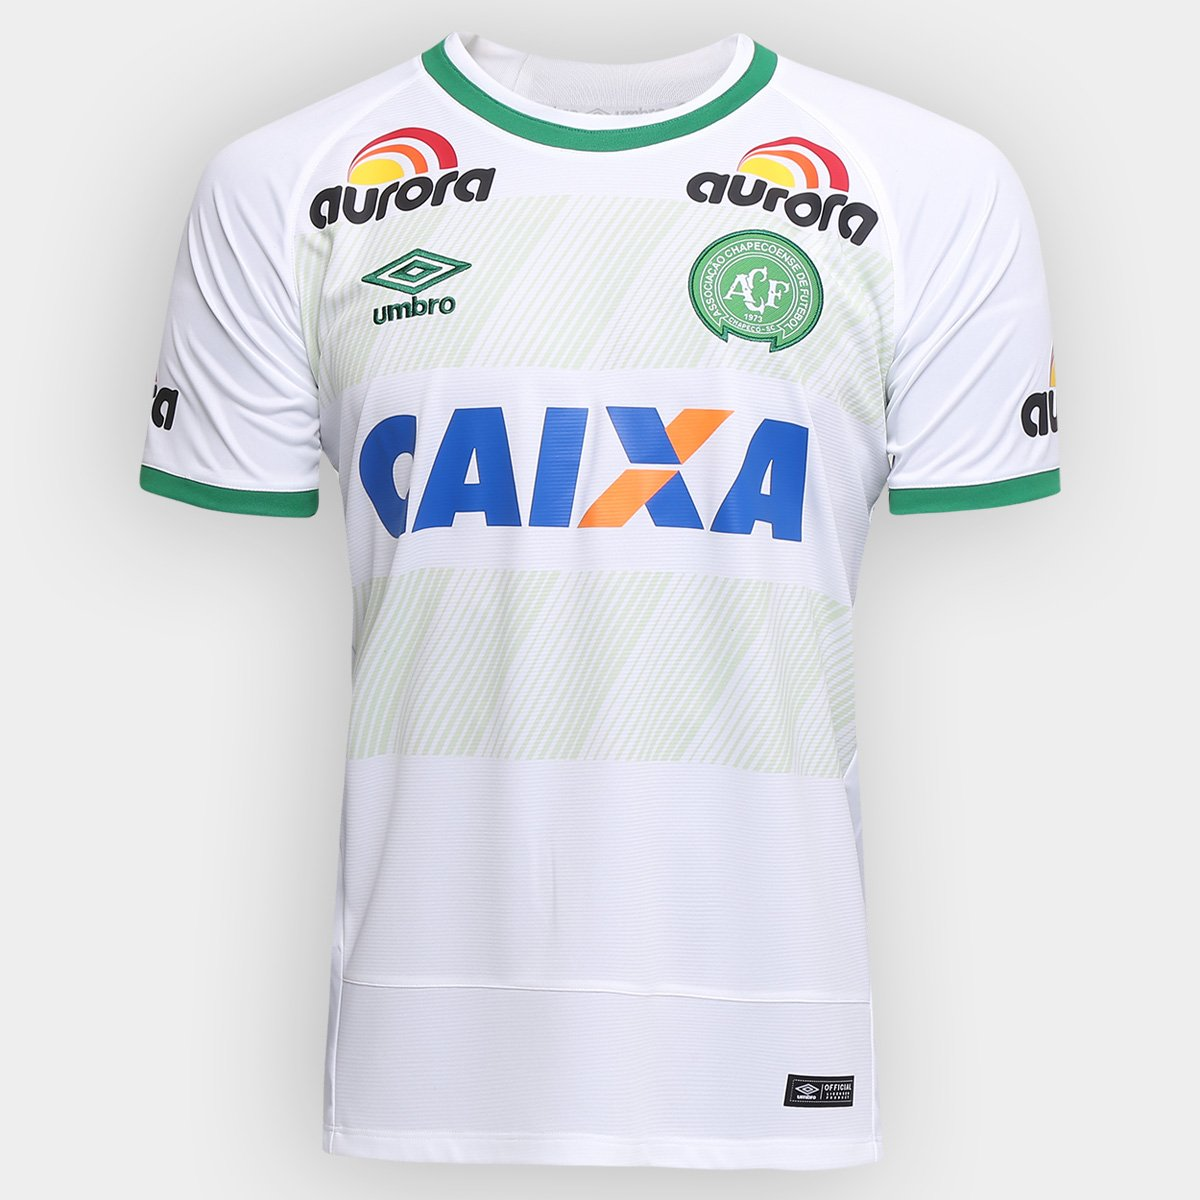 cb464409b Camisa Chapecoense II 2016 s nº Torcedor Umbro Masculina